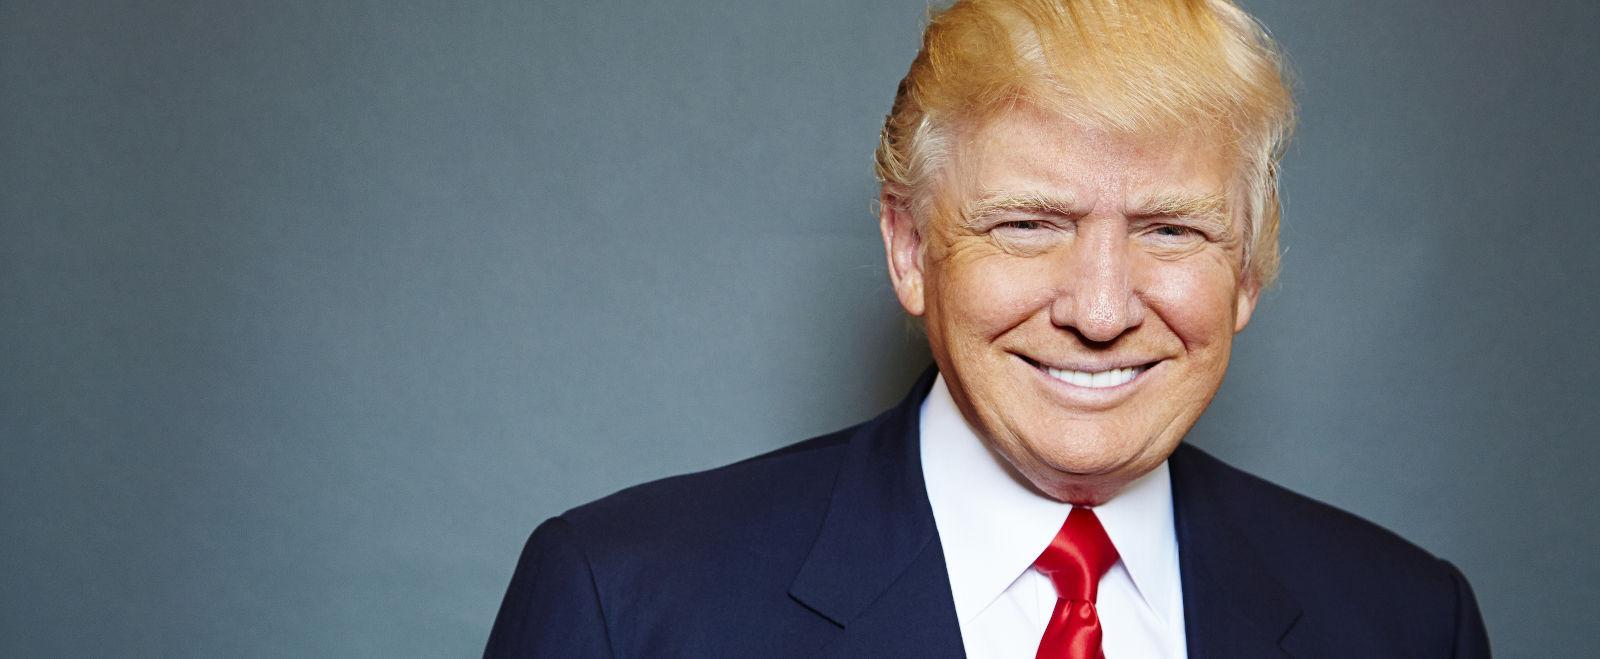 Трамп победил